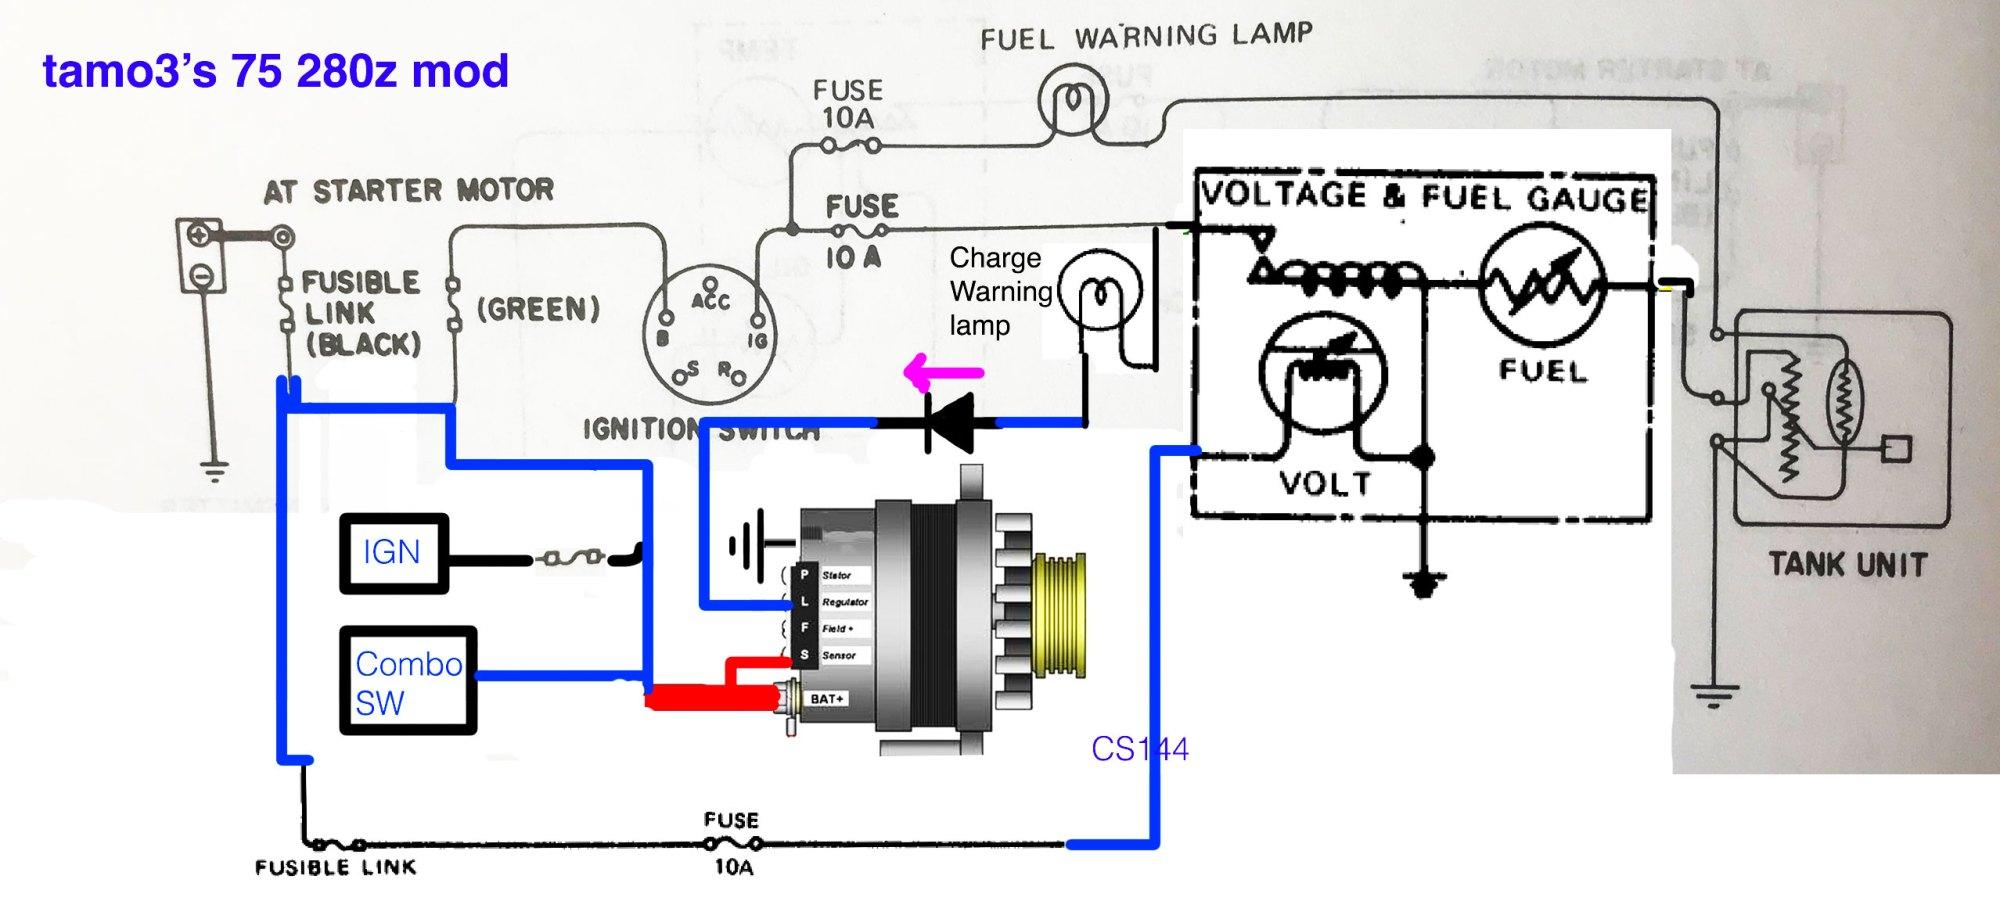 hight resolution of cs144 wiring diagram wiring diagram schema cs144 wiring diagram